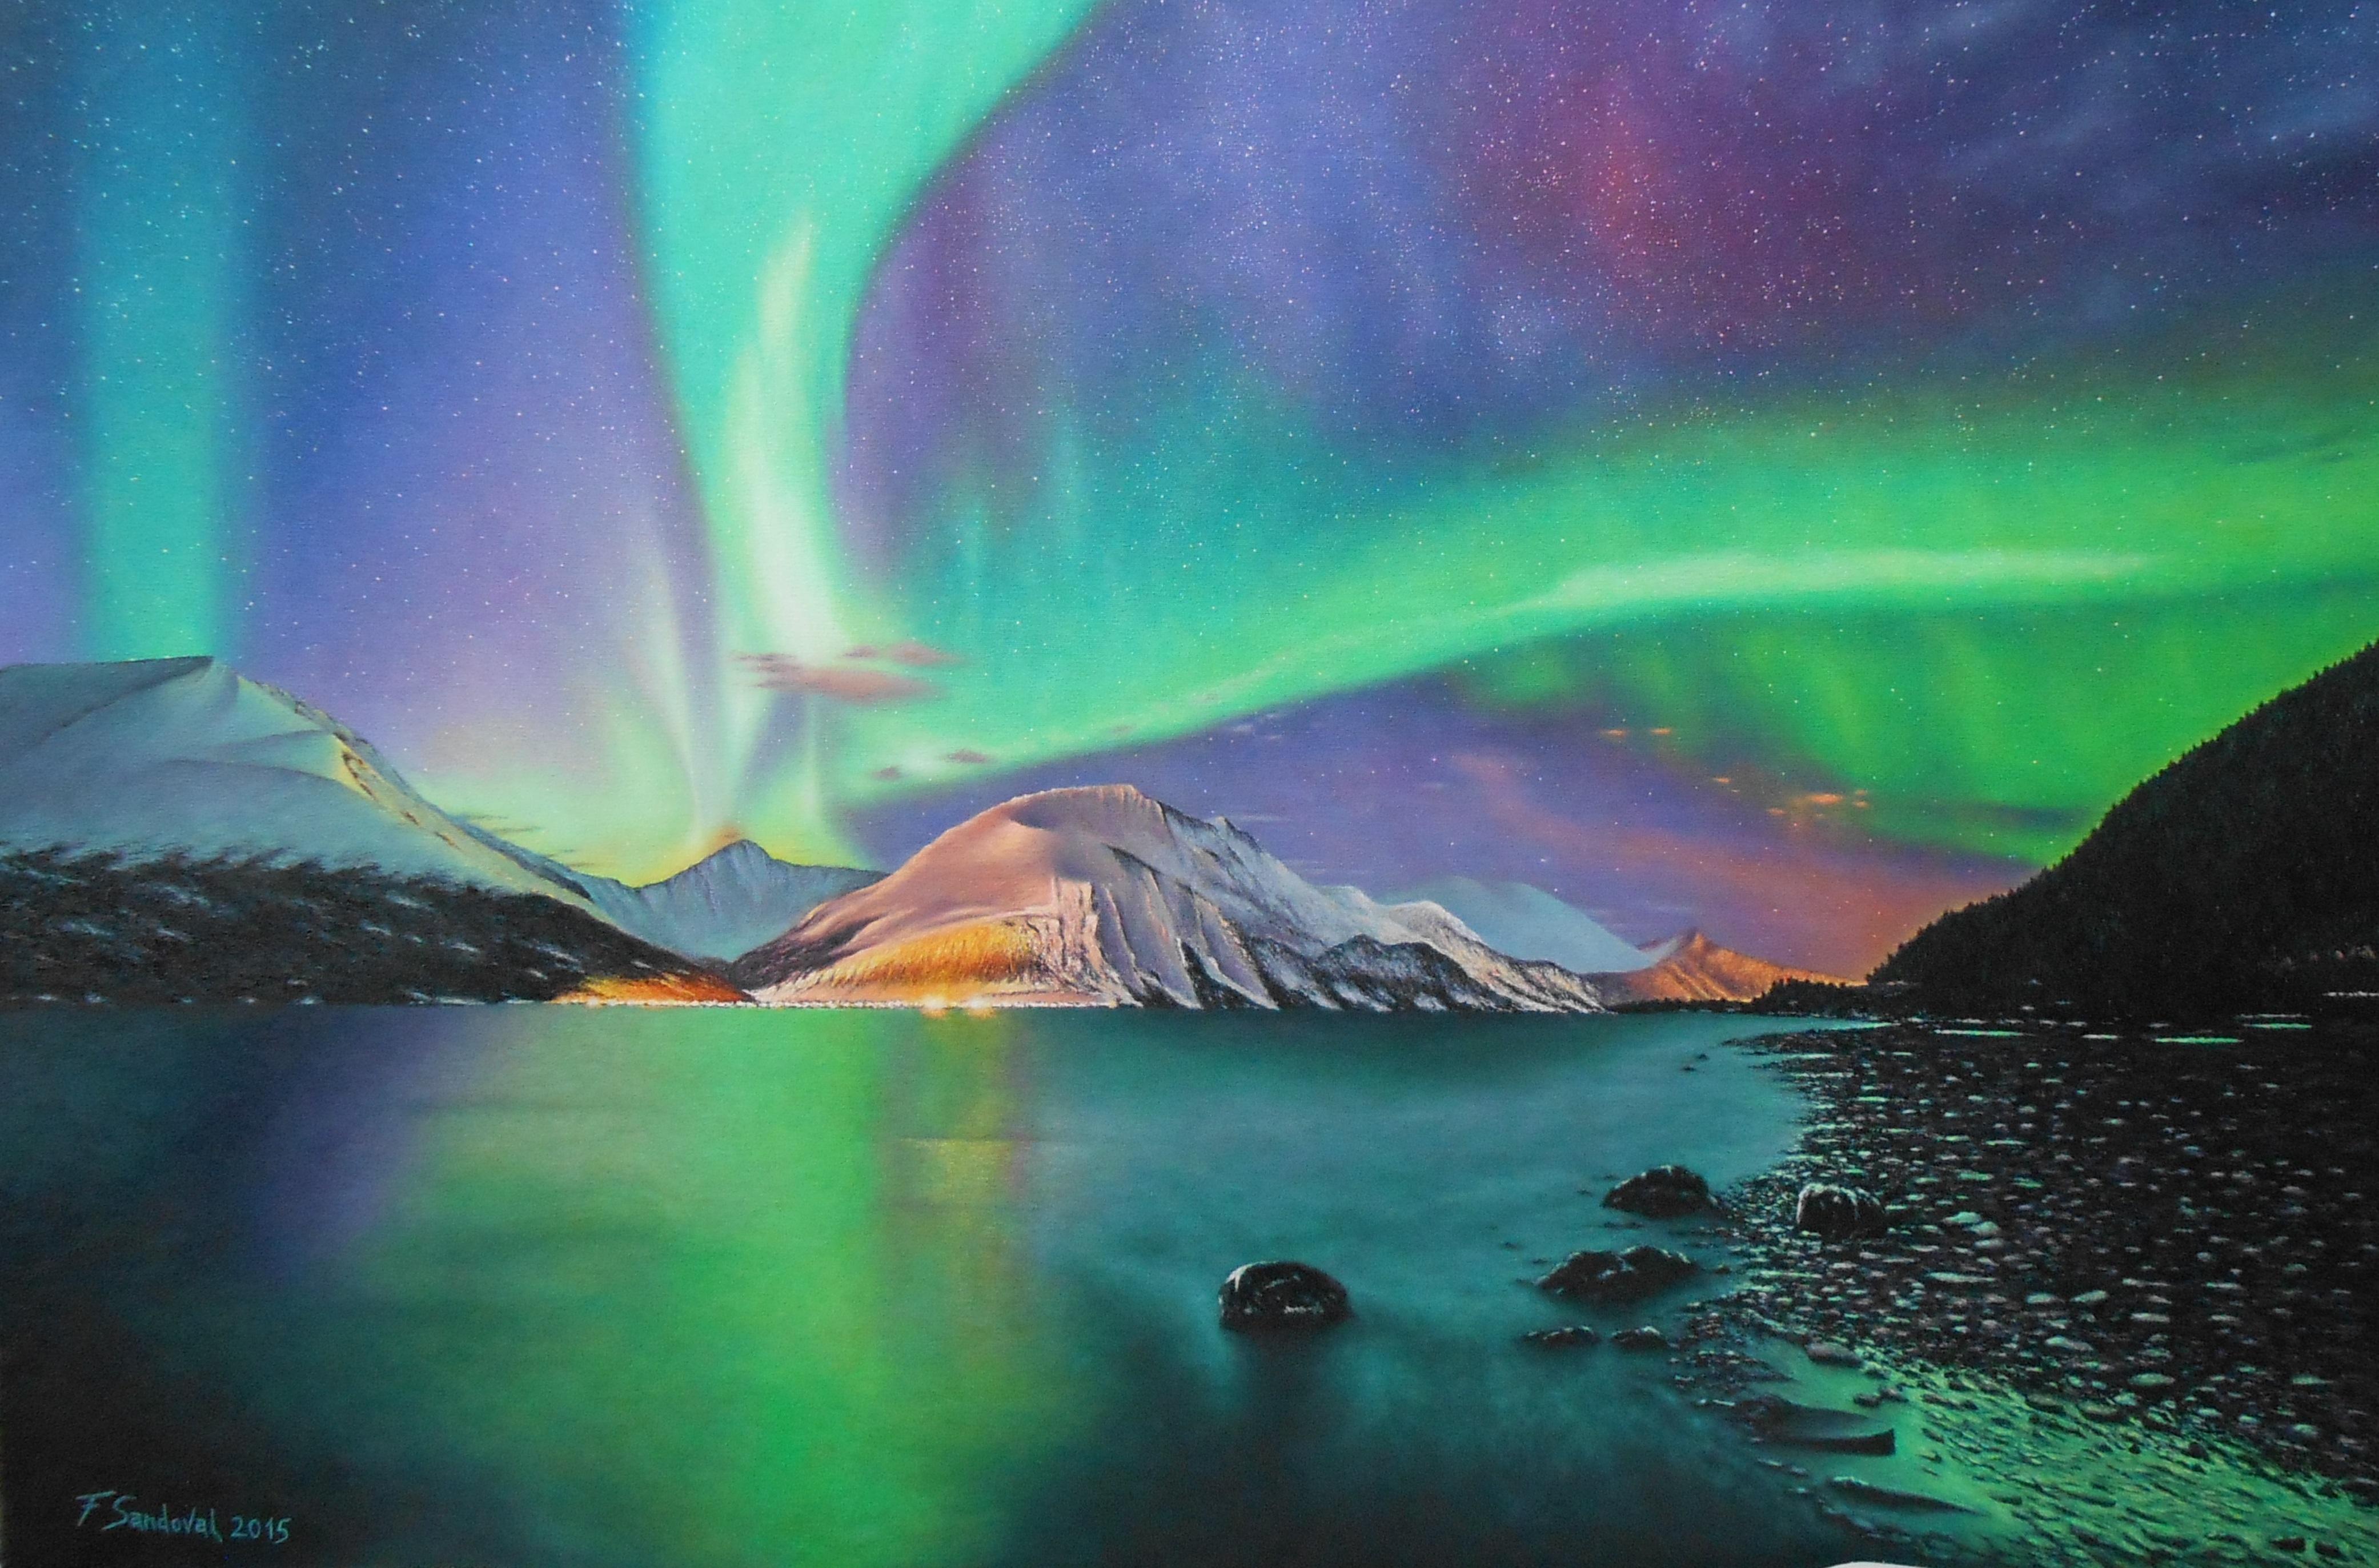 Aurora boreal - Francisco Sandoval Barbero